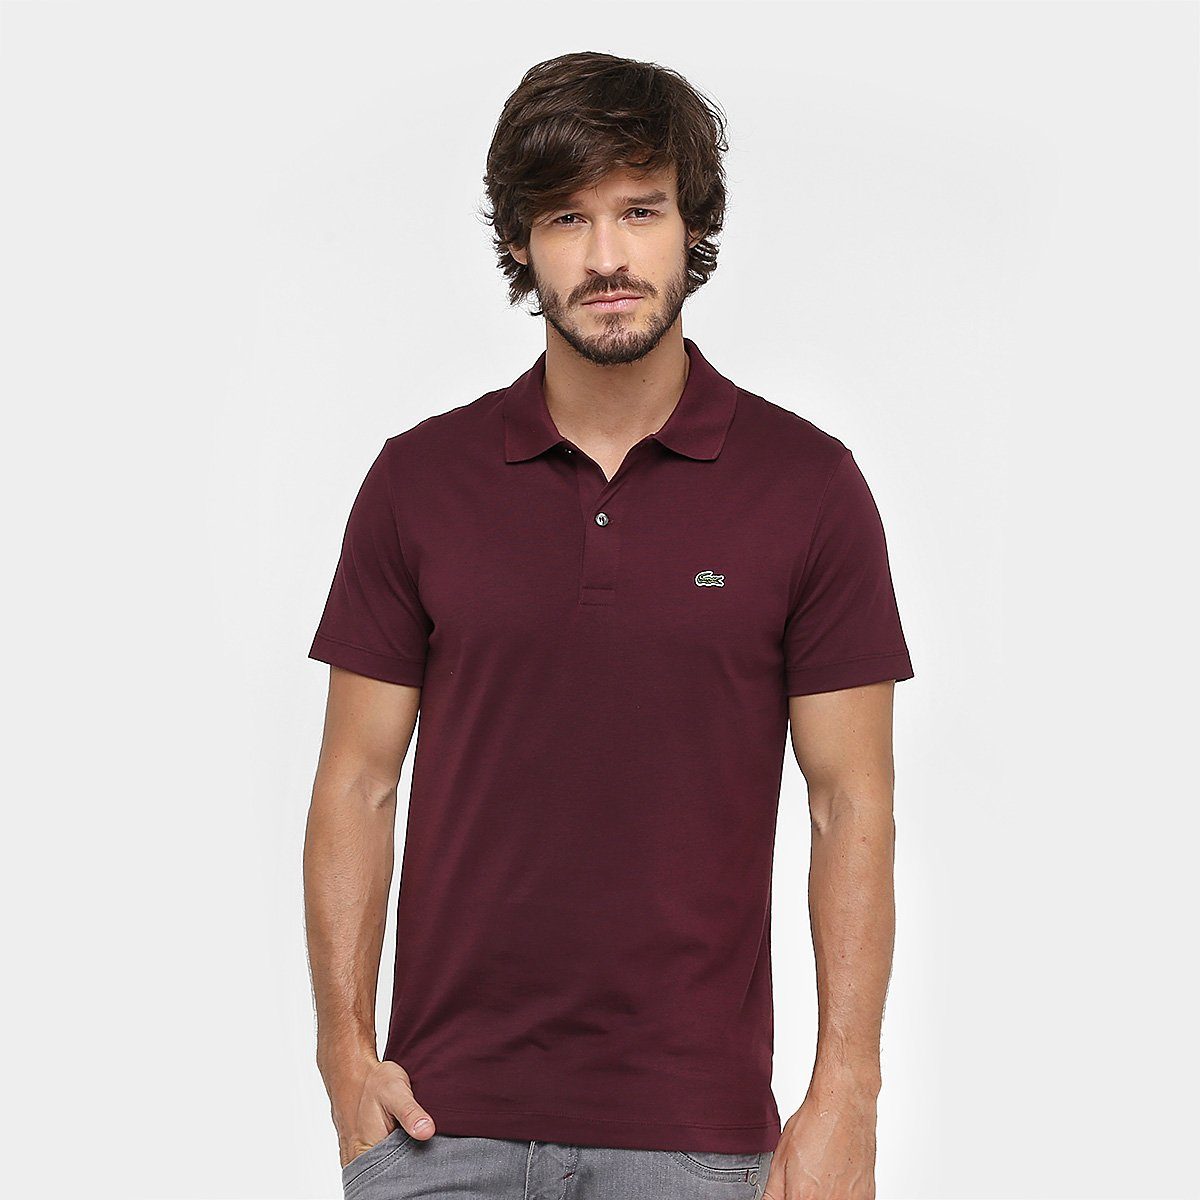 0497afef64529 Camisa Polo Lacoste Malha Original Fit Masculina - Bordô - Compre Agora